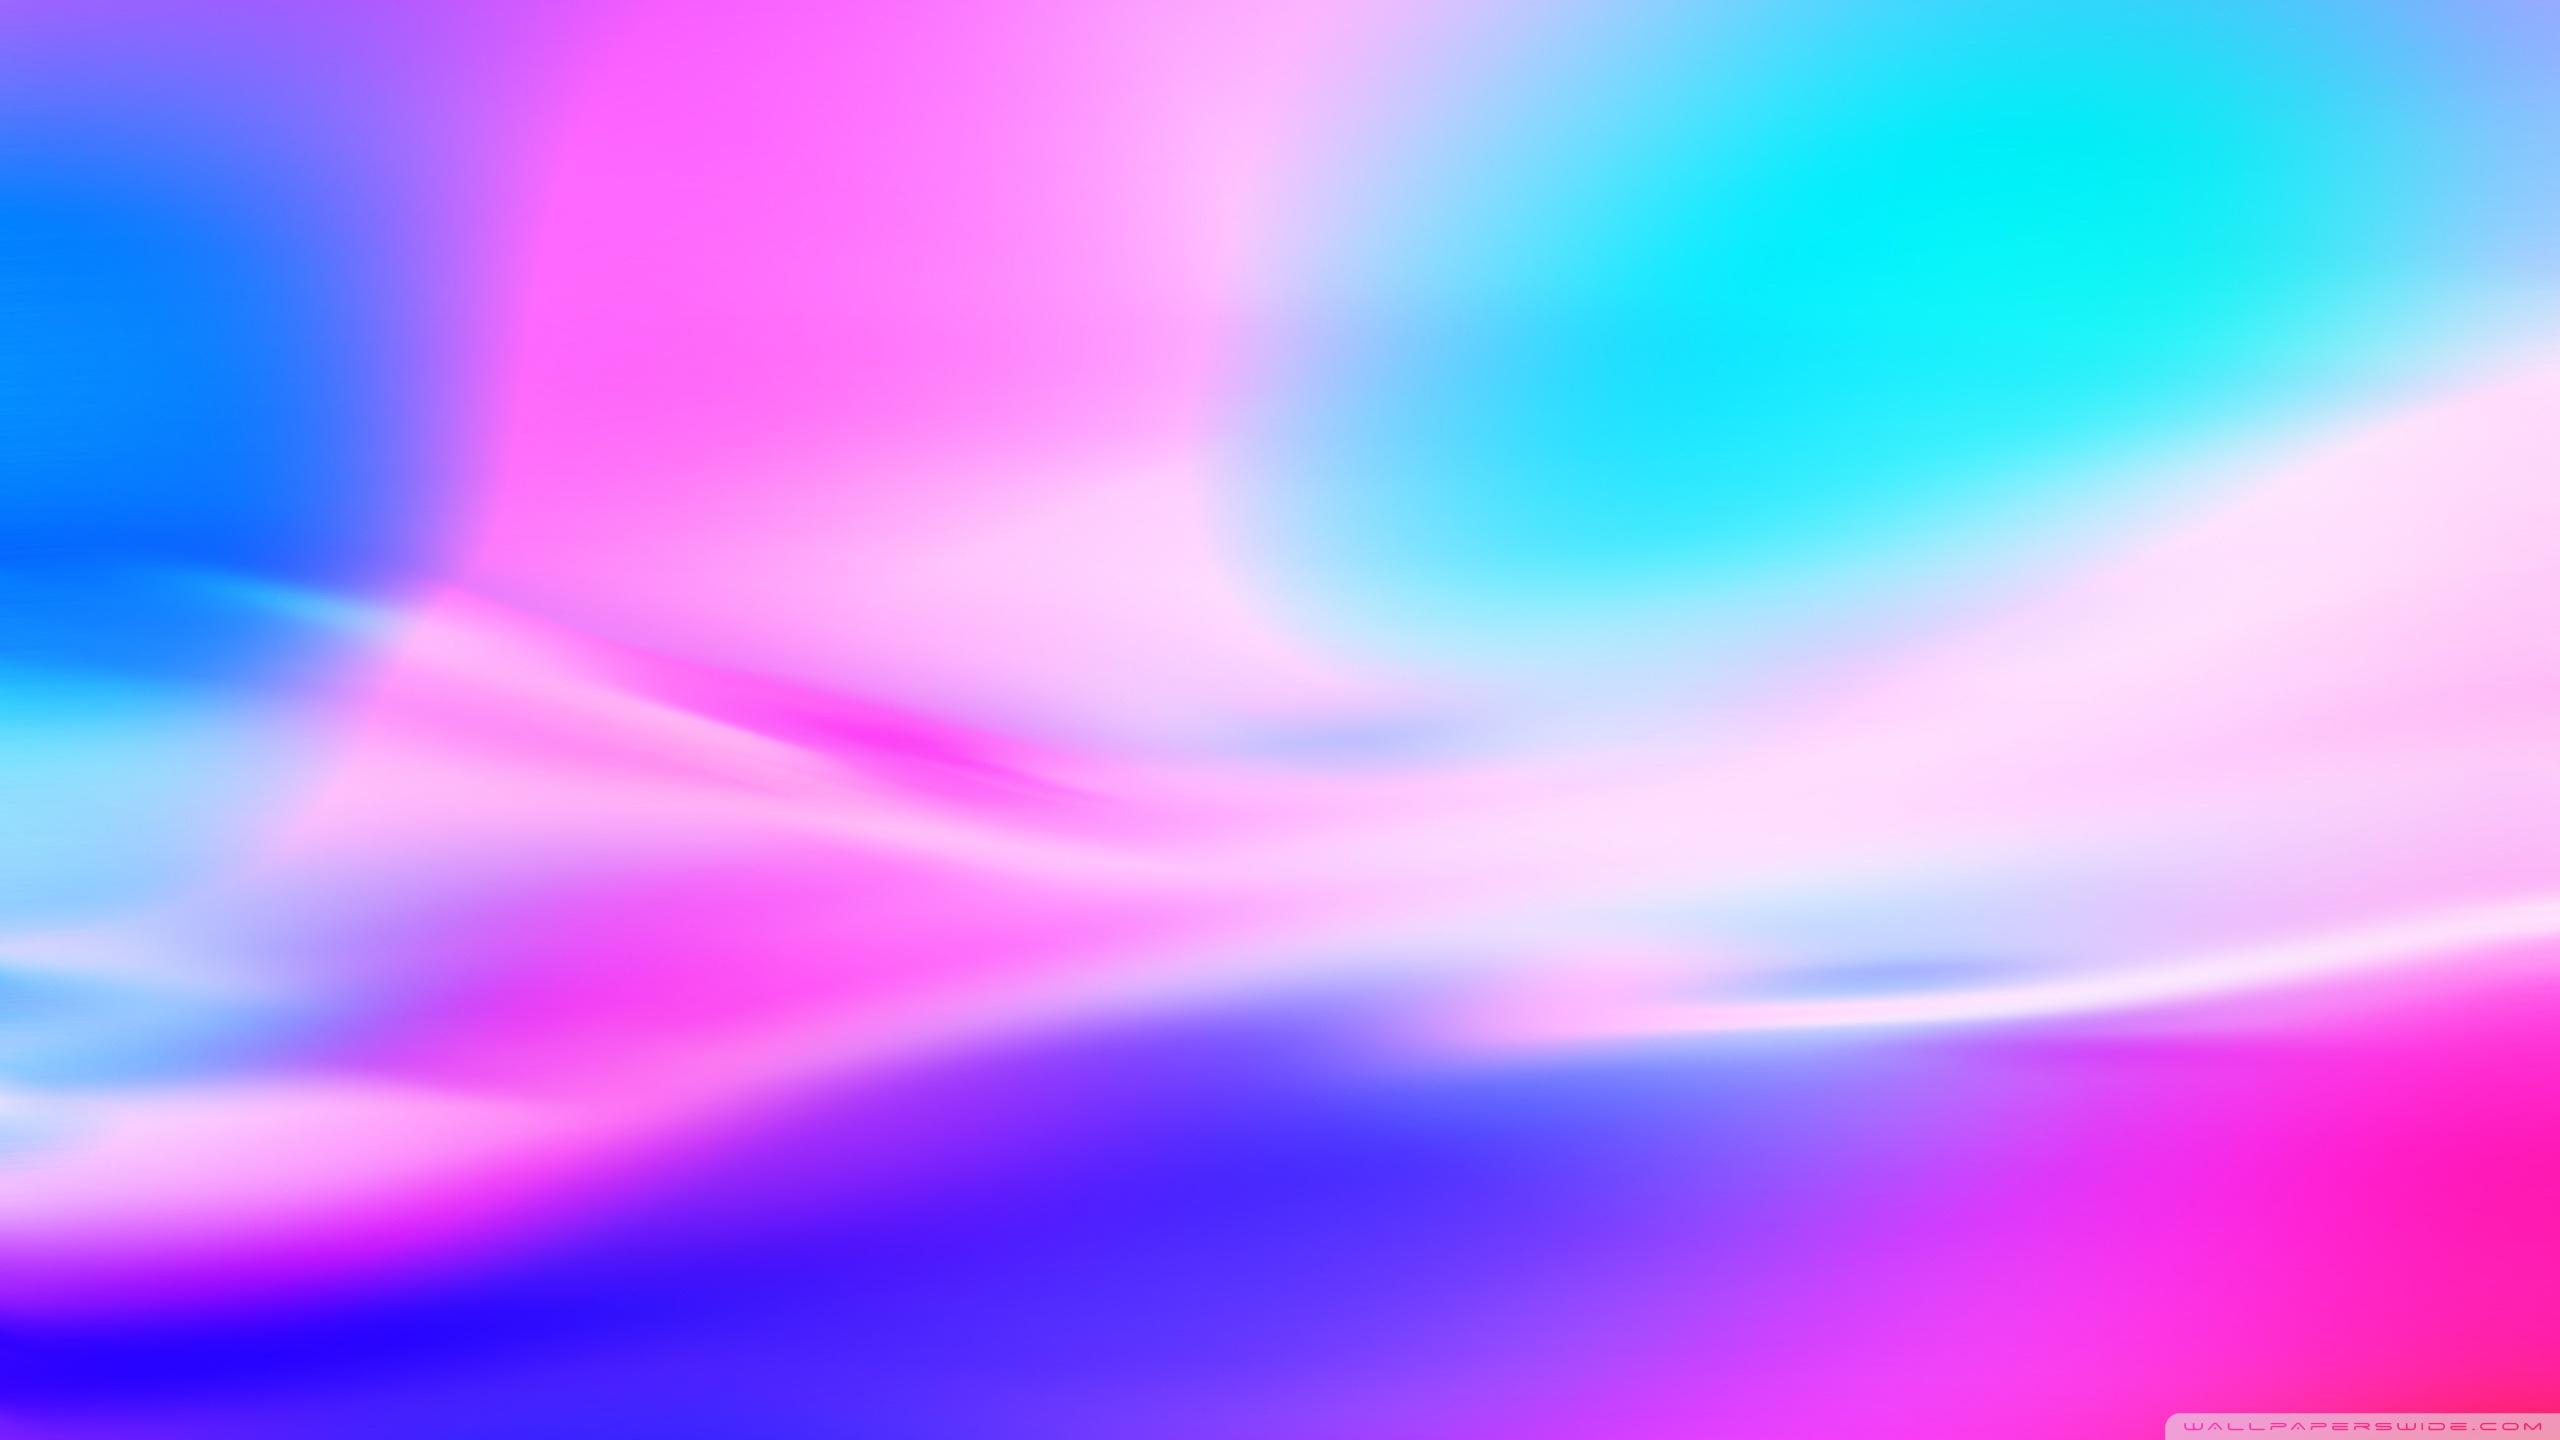 Pink Wallpaper   WallpaperNebula 2560x1440